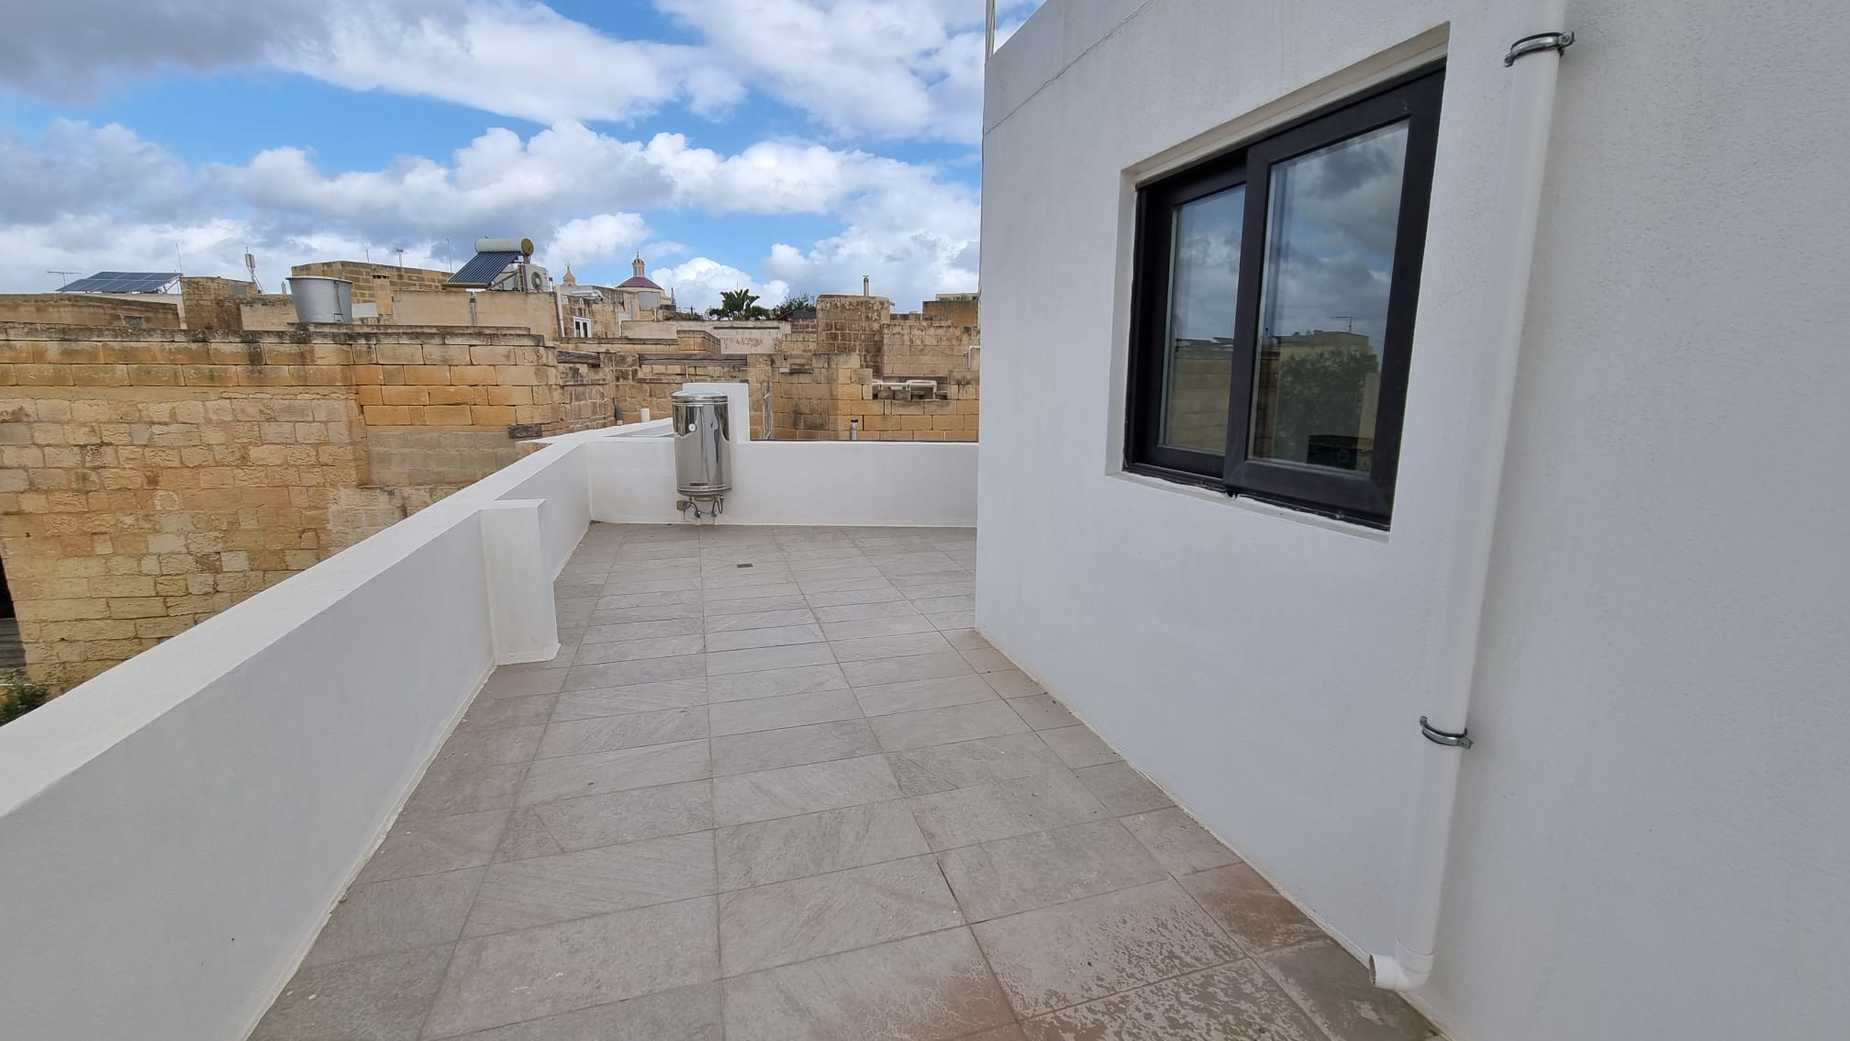 4 bed Villa For Sale in Gharghur, Gharghur - thumb 7